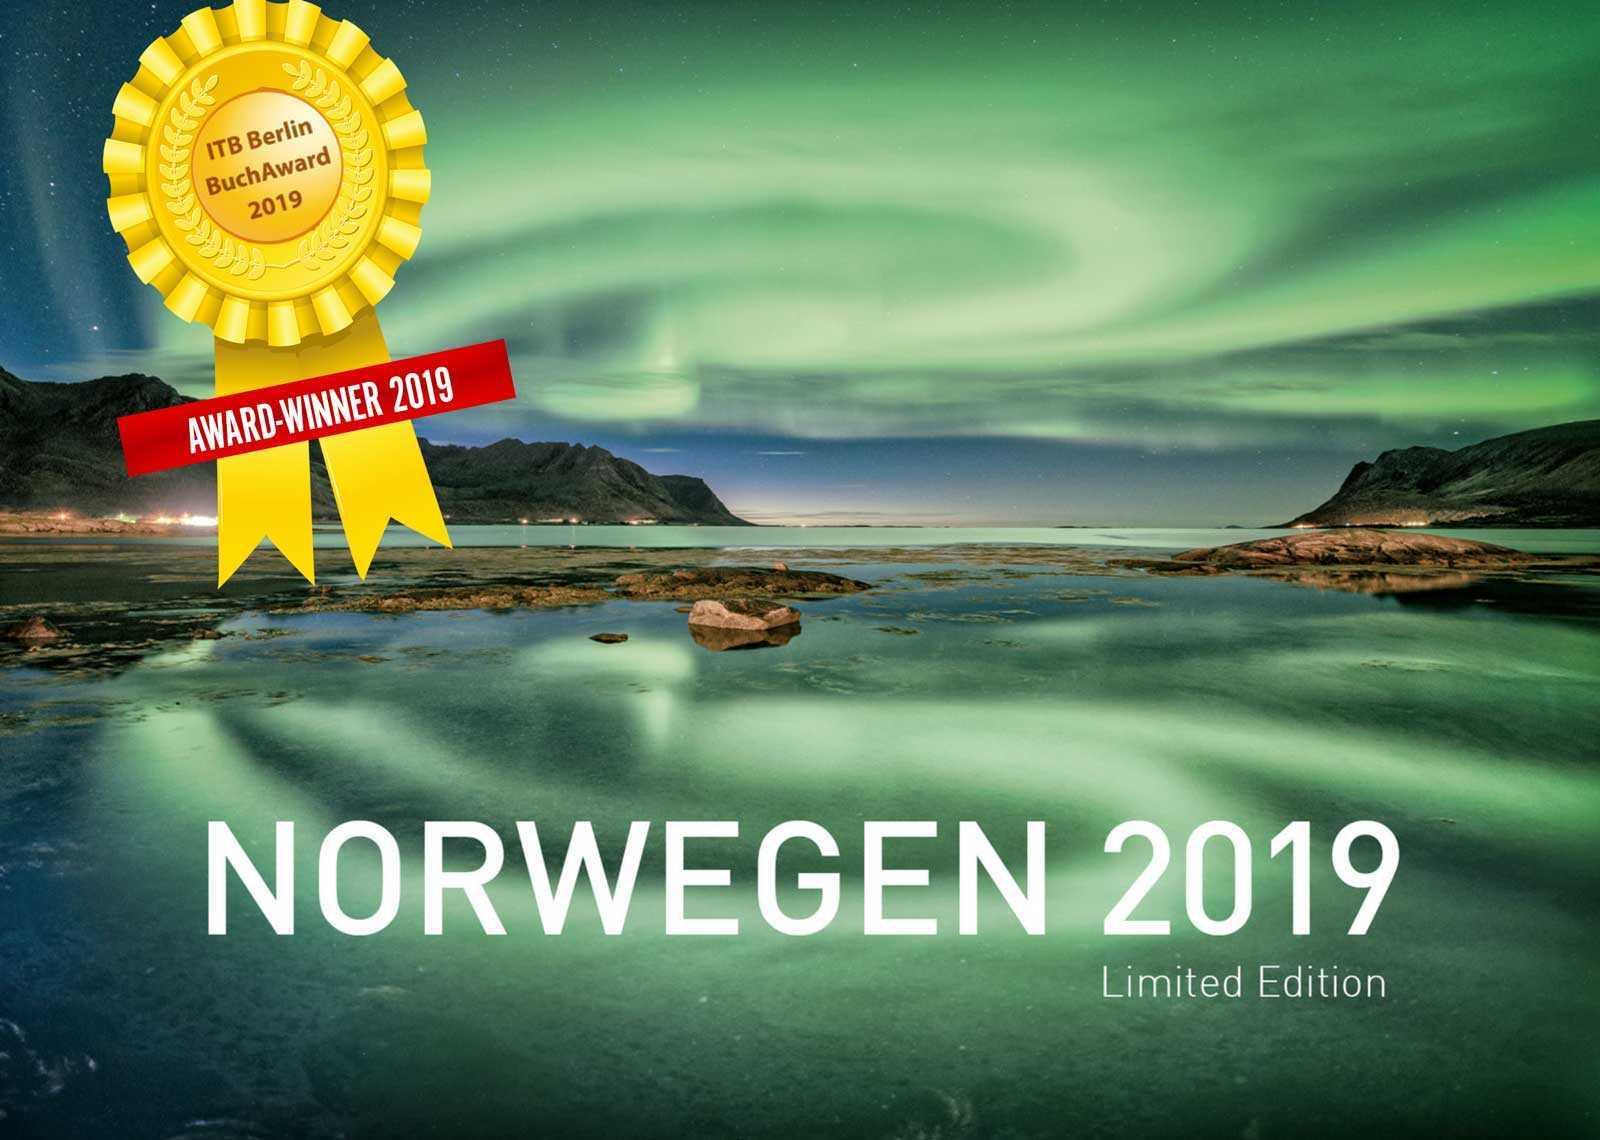 Preisgekrönter Kalender ITB BuchAward 2019 Norwegen Zwerger-Schoner